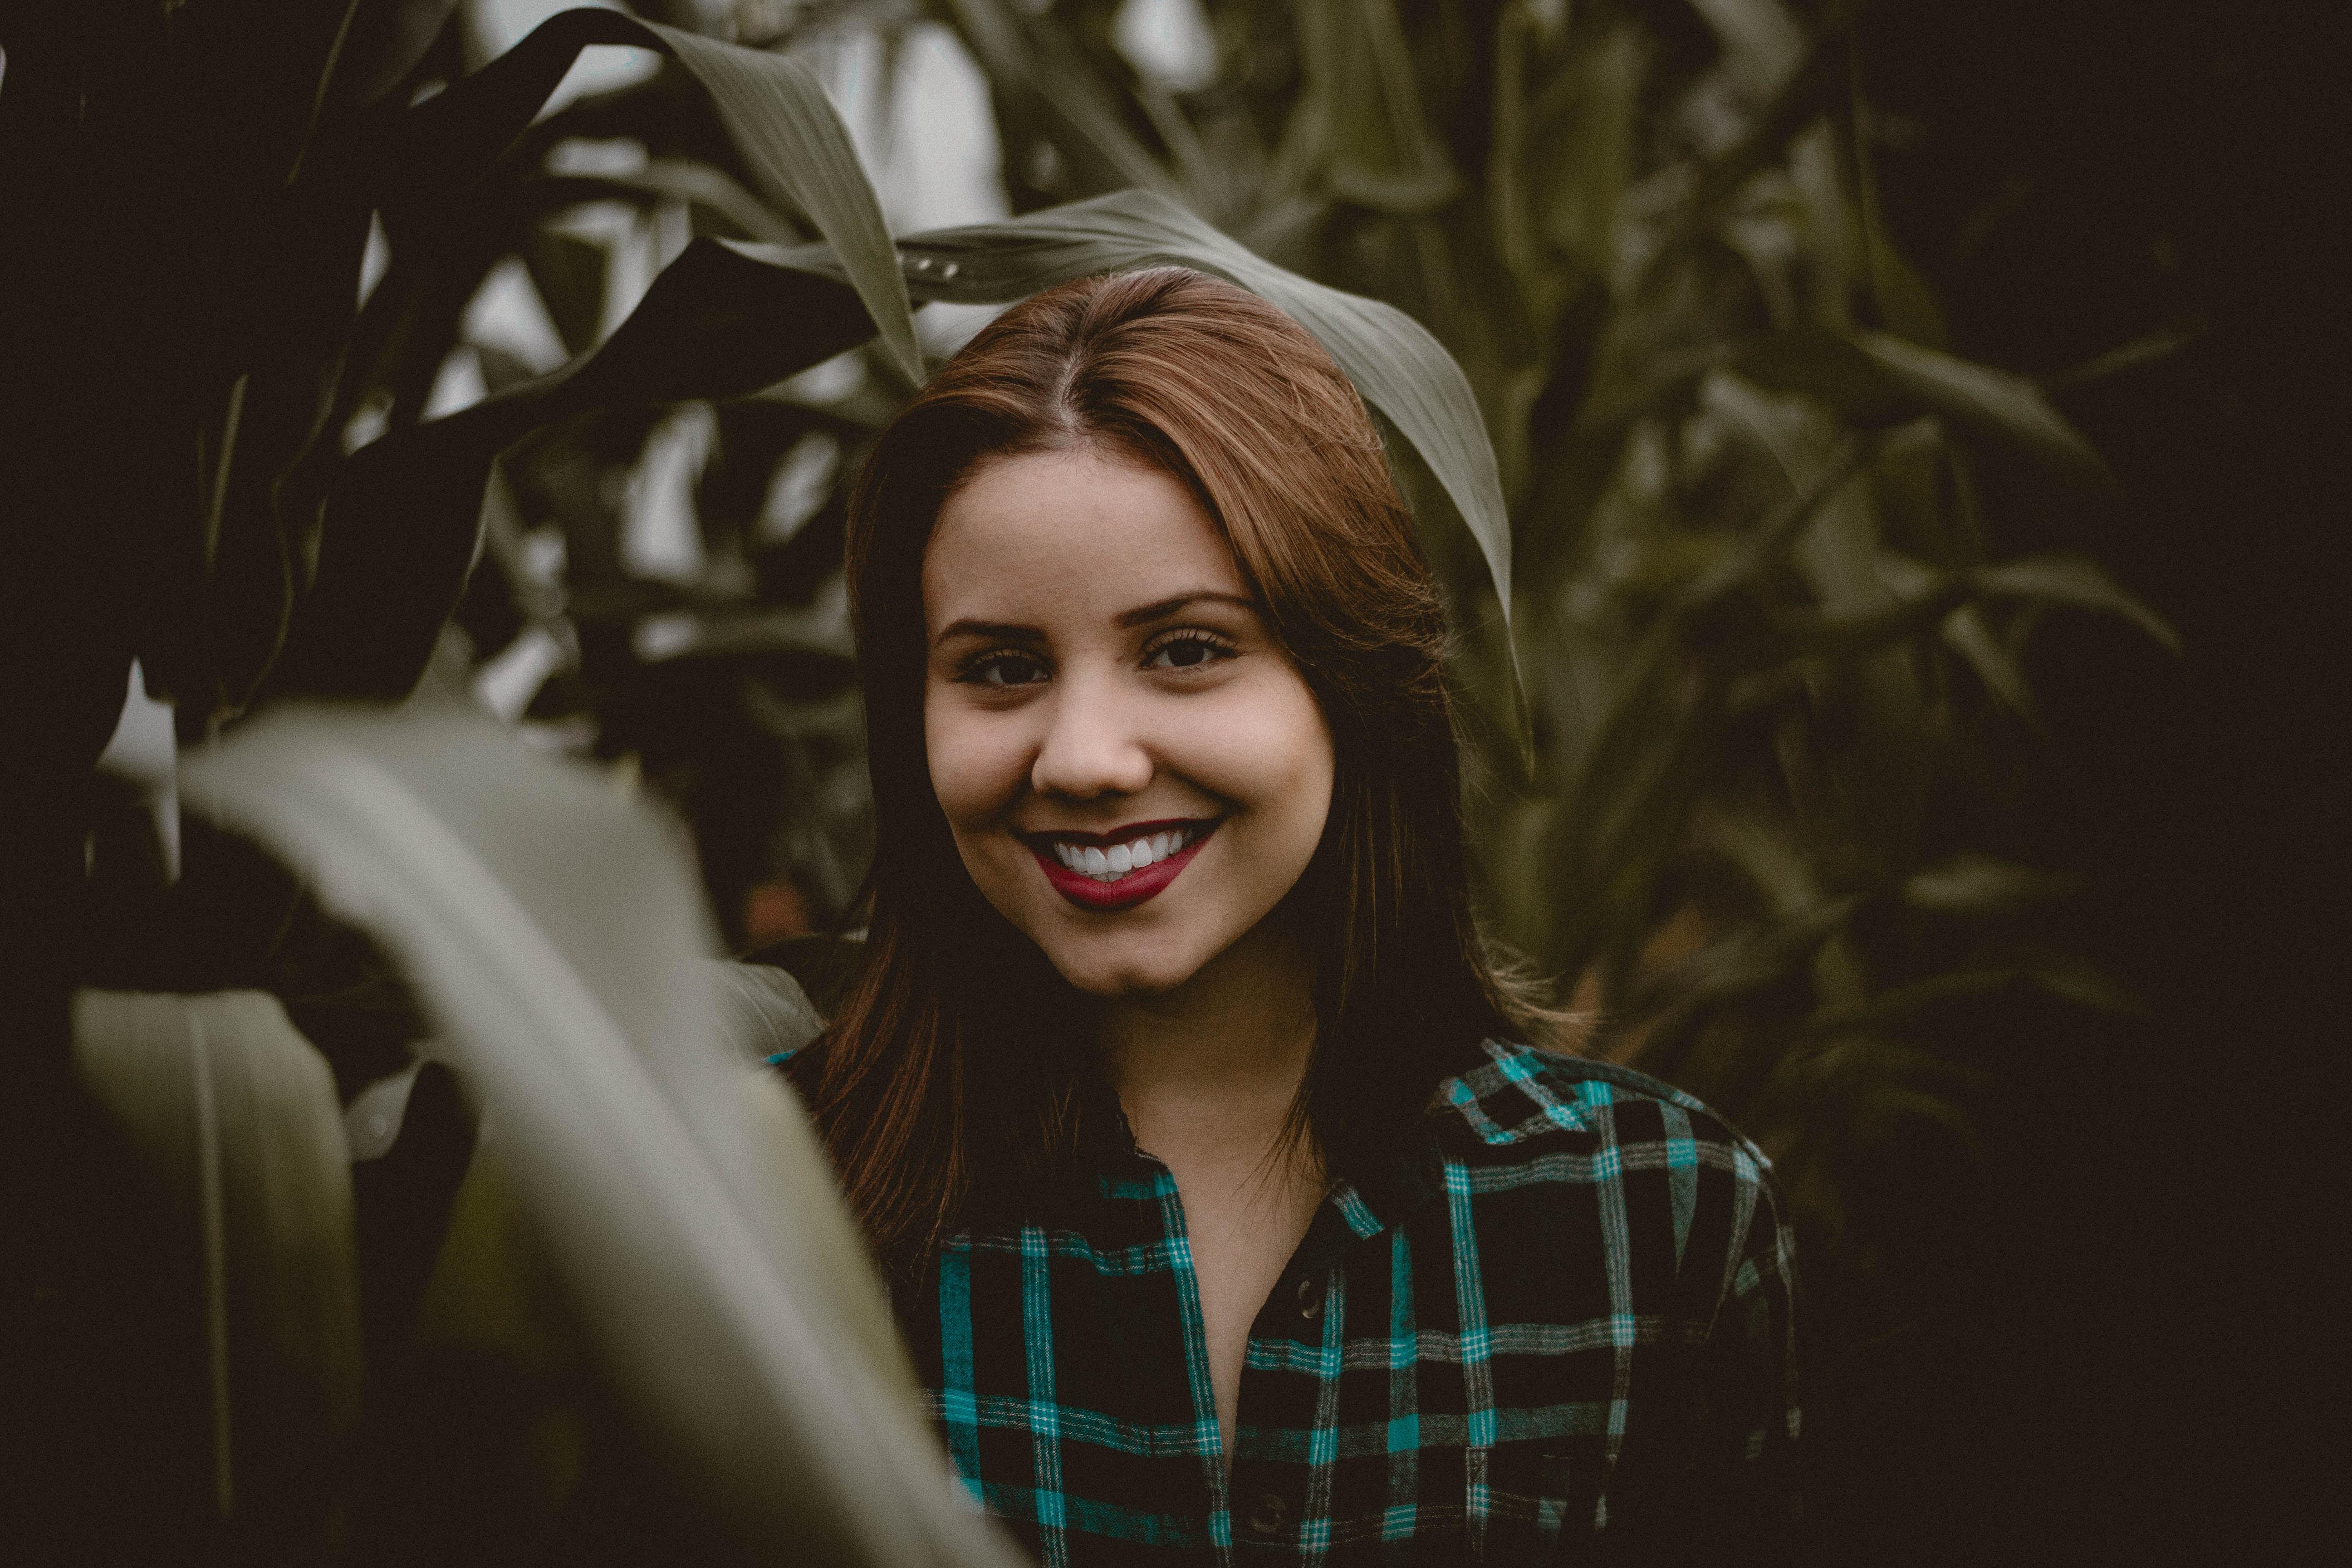 woman in the corn field